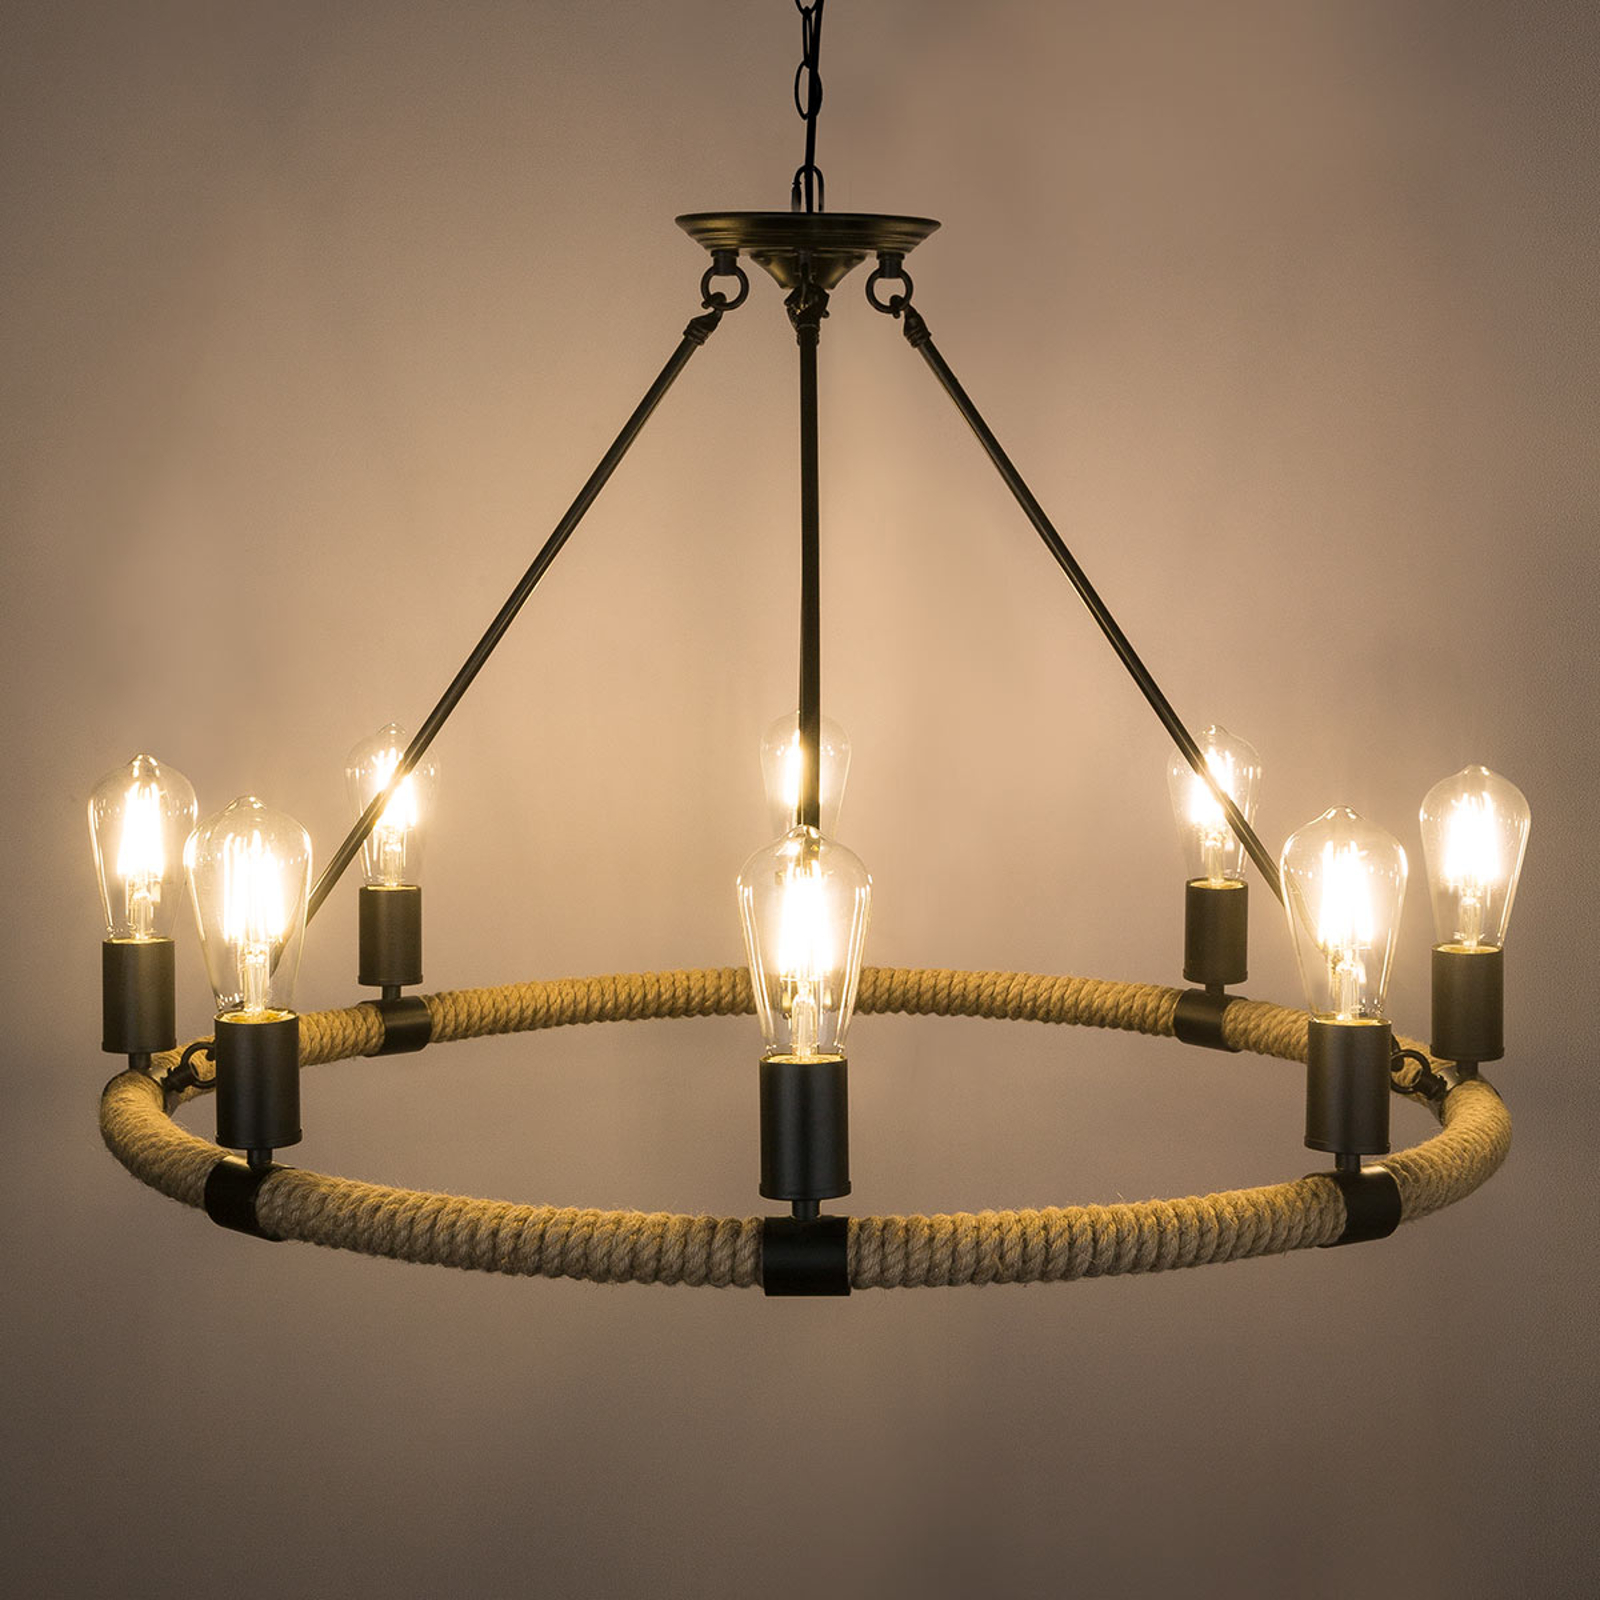 Ronde LED hanglamp Ulleu met henneptouw 8-lamps